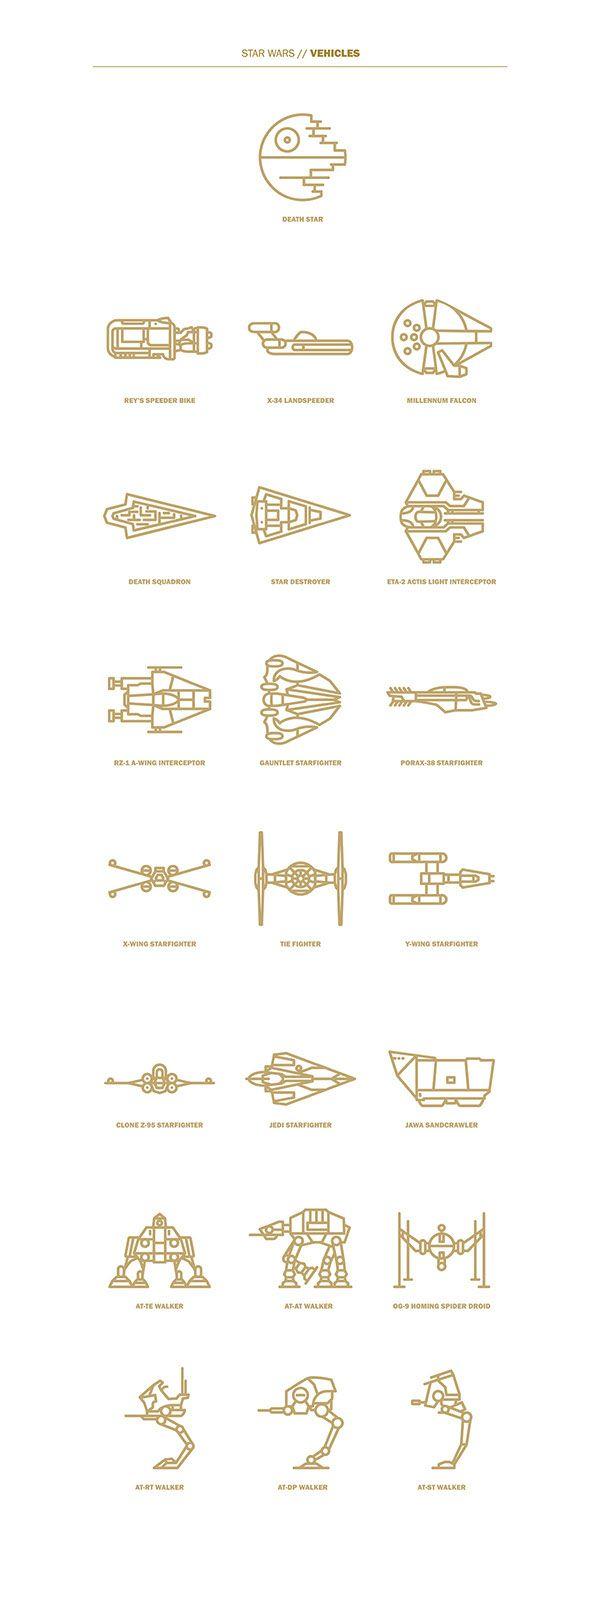 Star Wars flat icons #Starwars #icon #flaticon #iconset